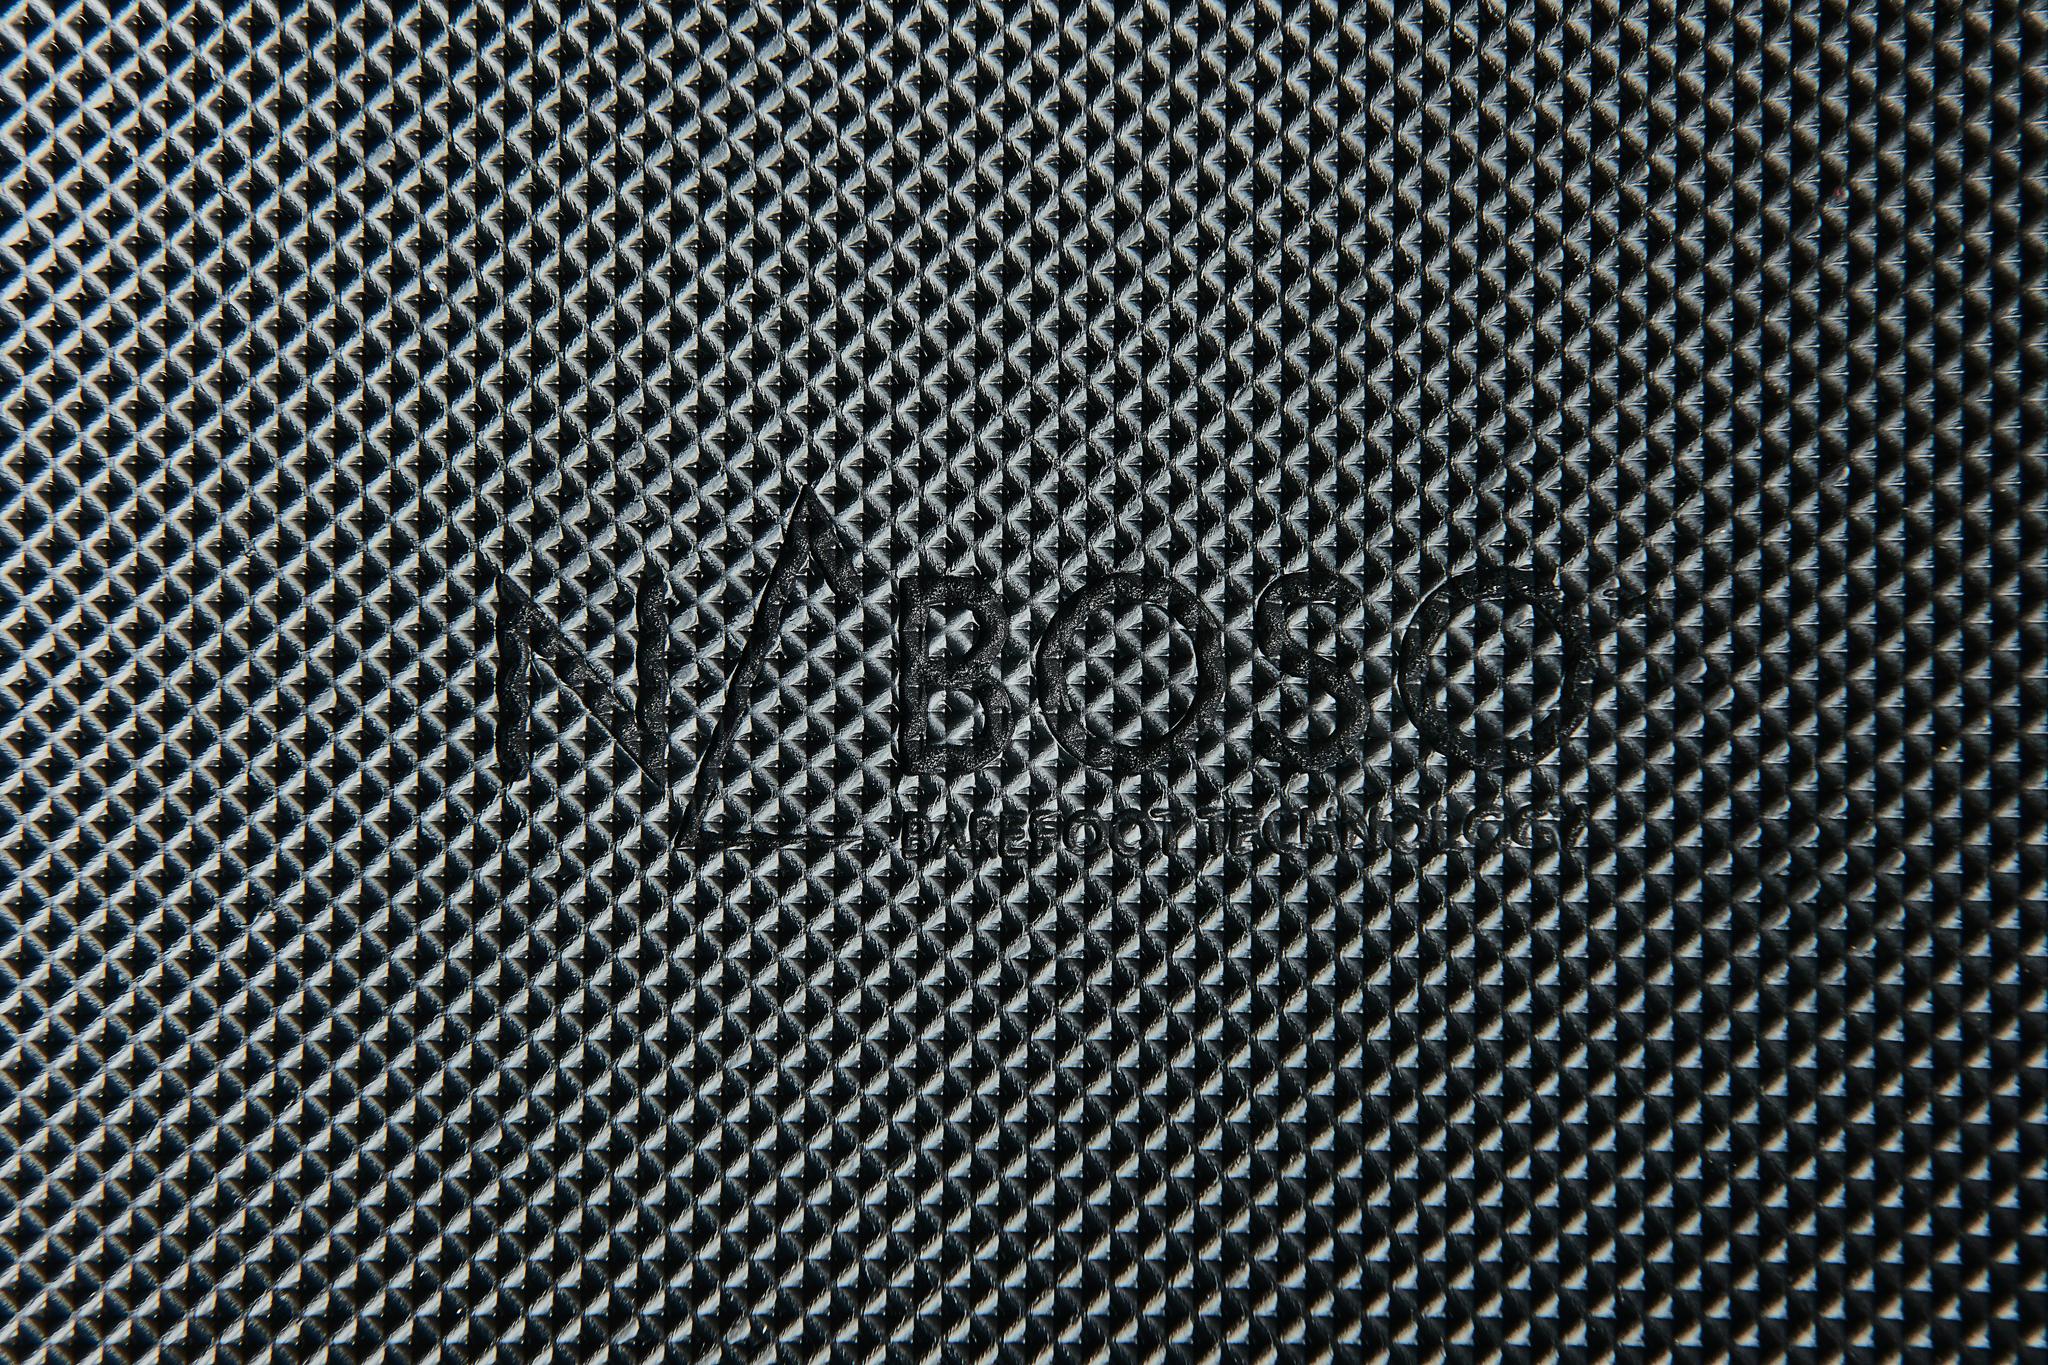 NABOSO_120518_Standing_Mat_Detail_1.jpg